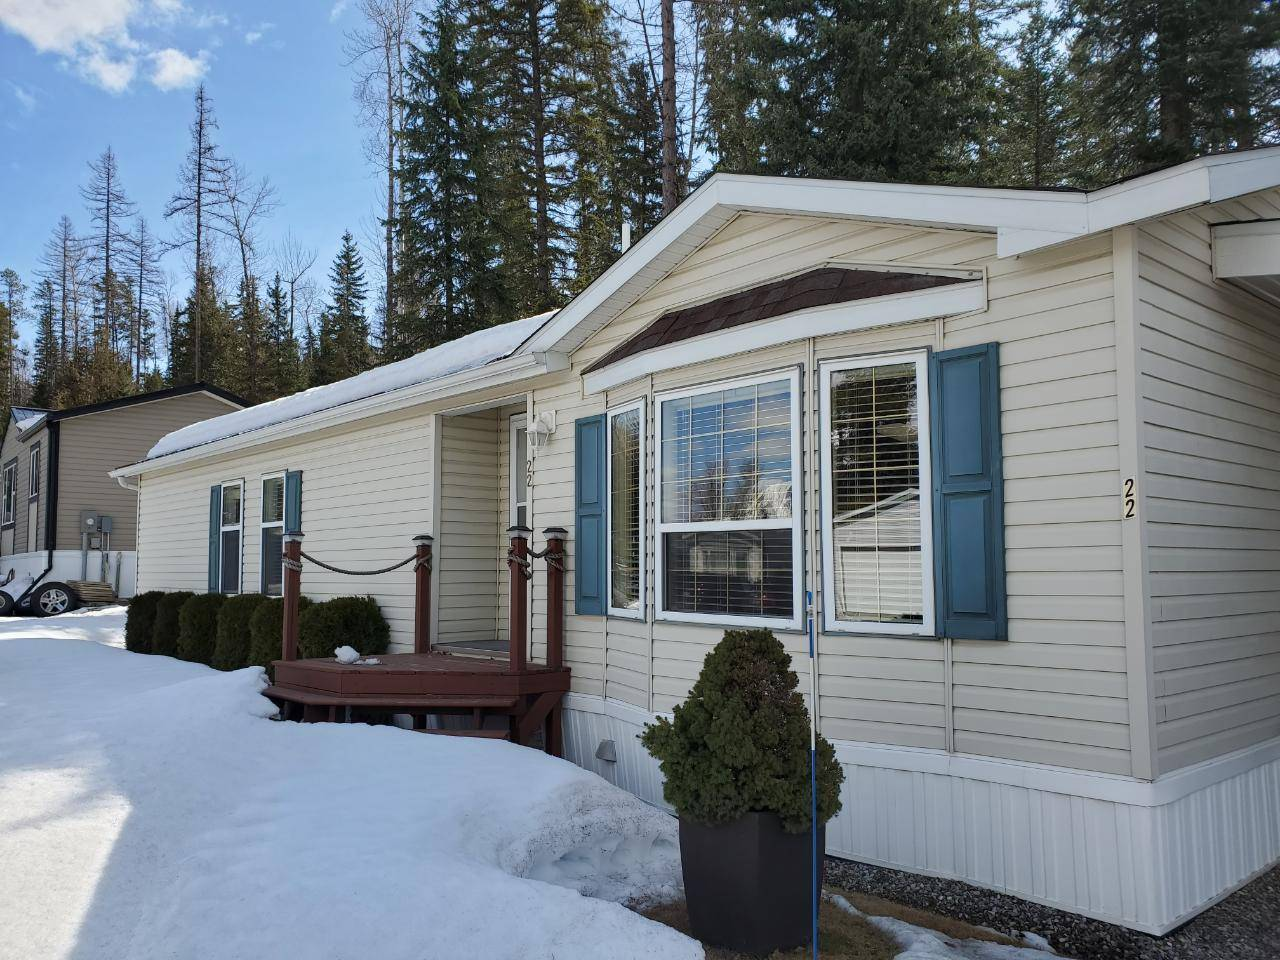 House for sale at 22 Slalom Drive  Fernie British Columbia - MLS: 2451466